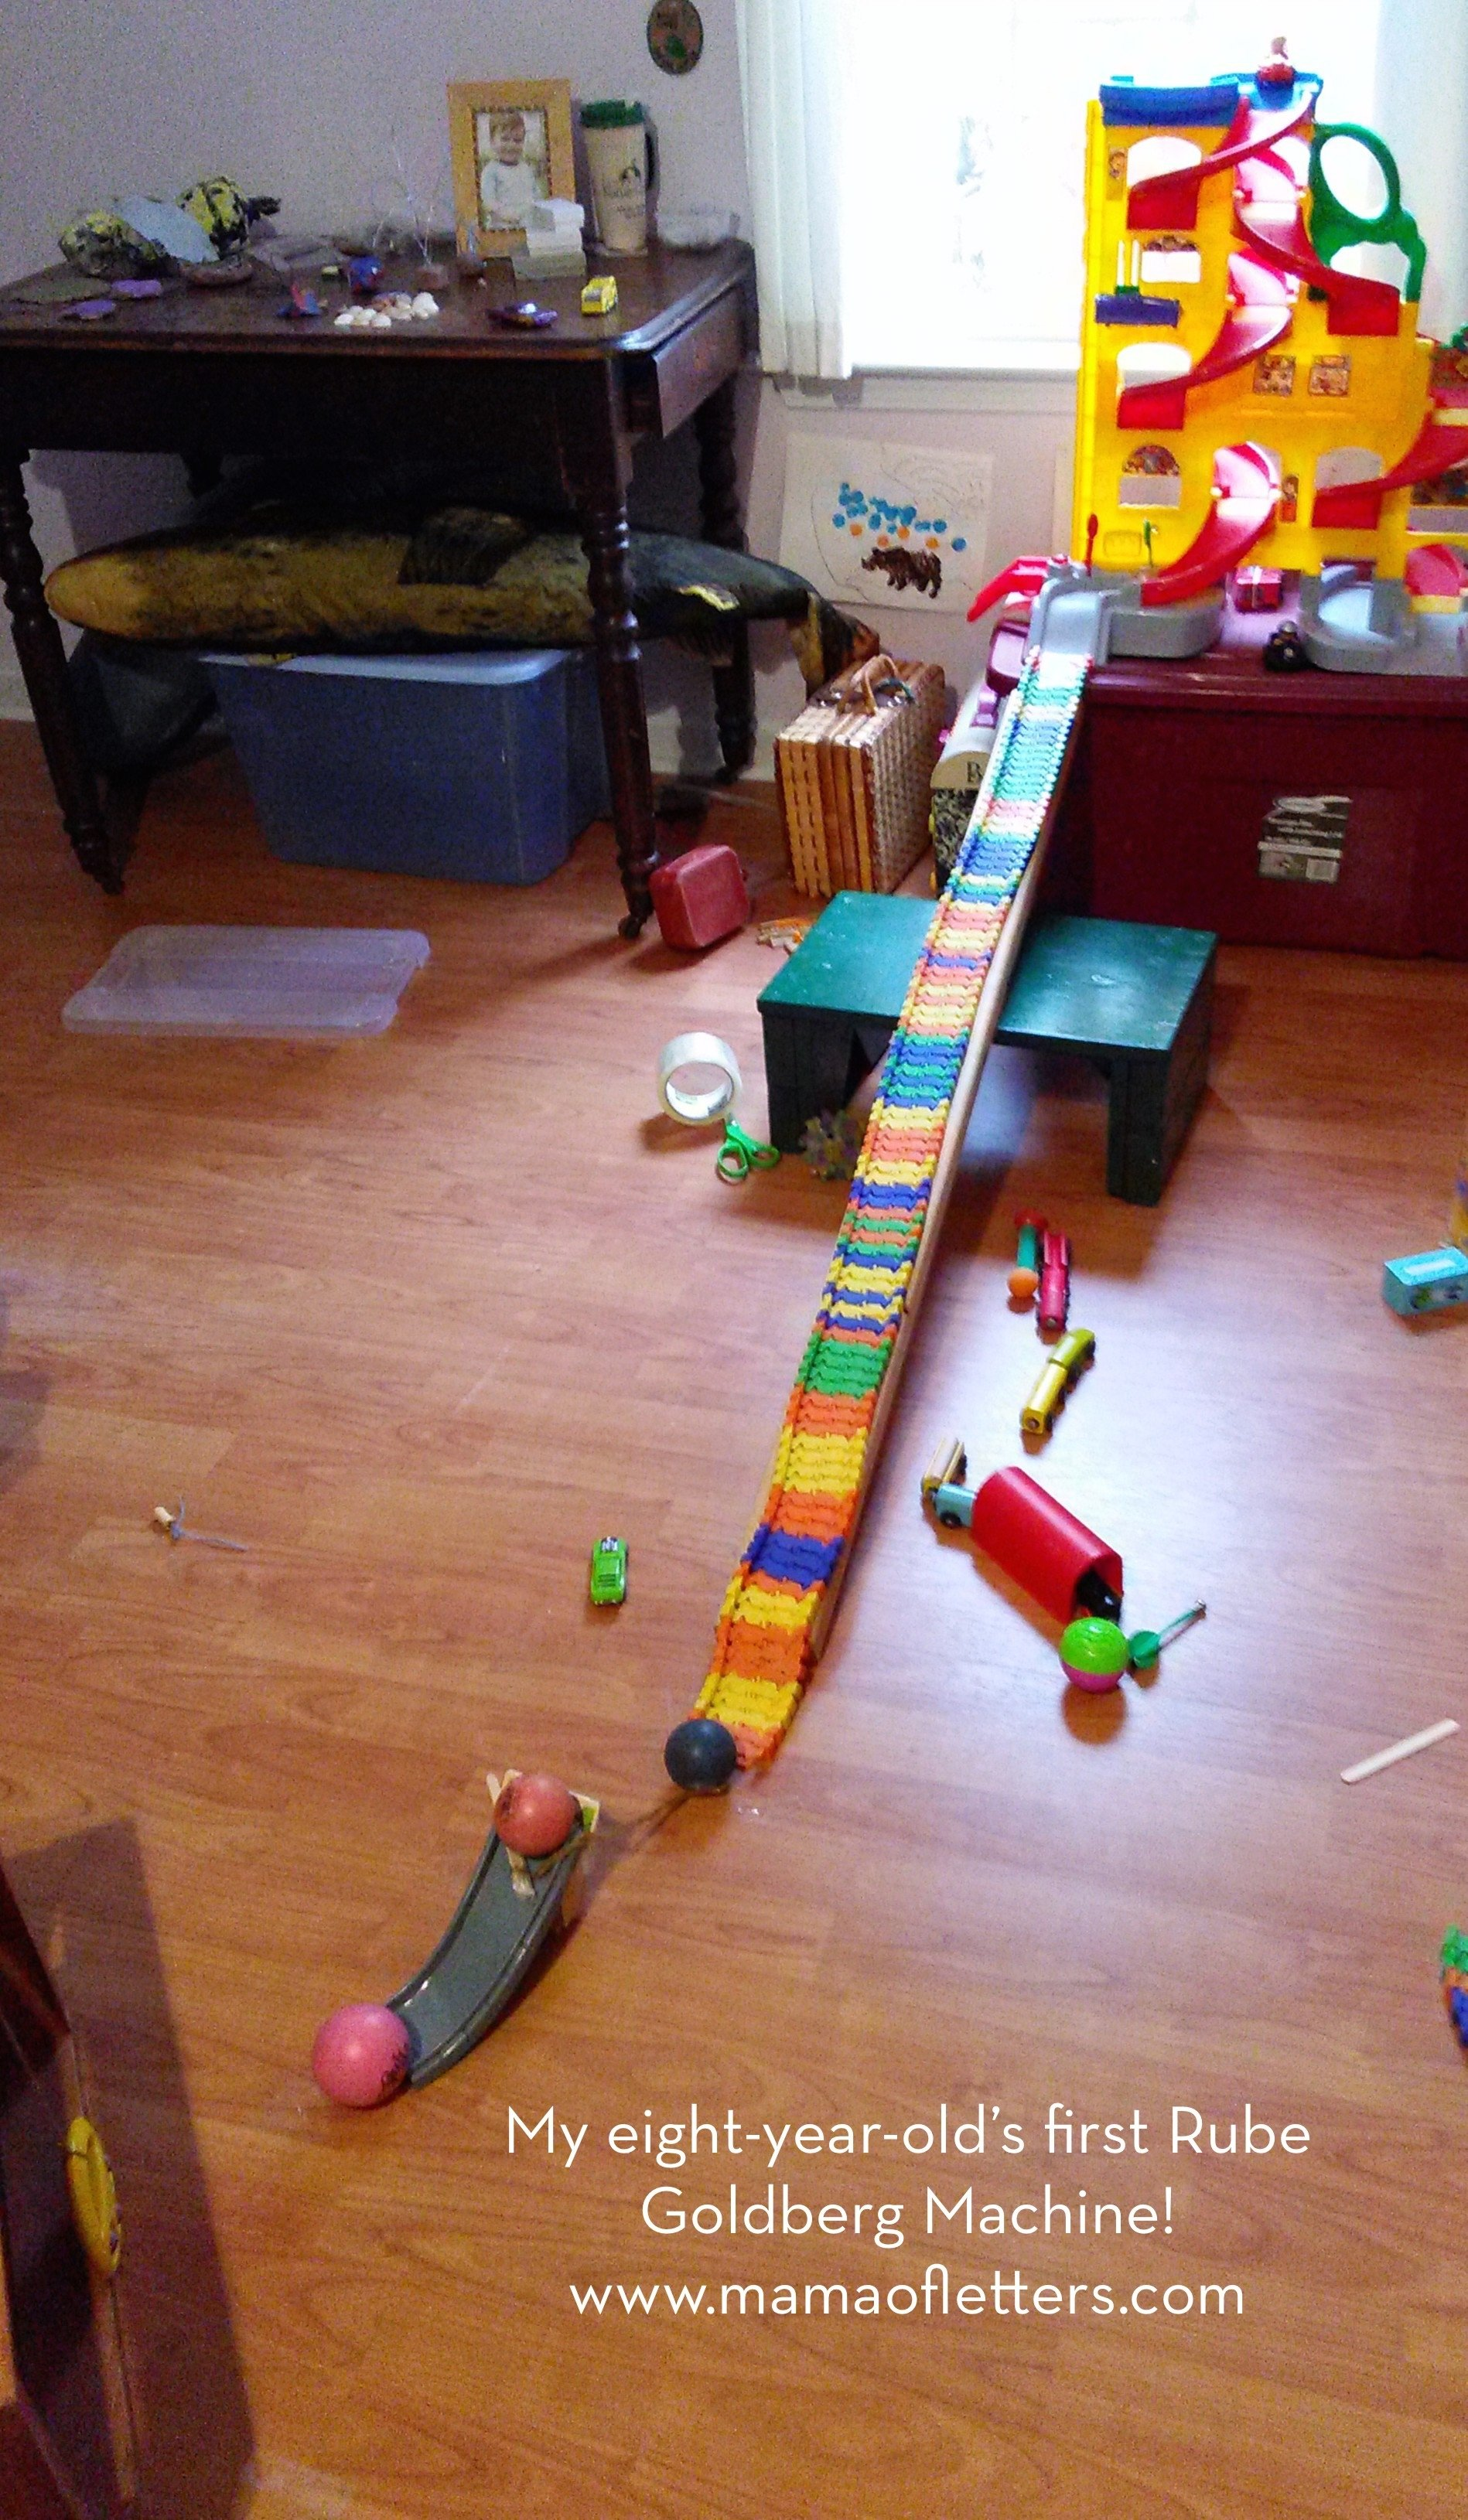 10 Stunning Simple Rube Goldberg Machine Ideas project based homeschooling rube goldberg machine mama of letters 1 2021